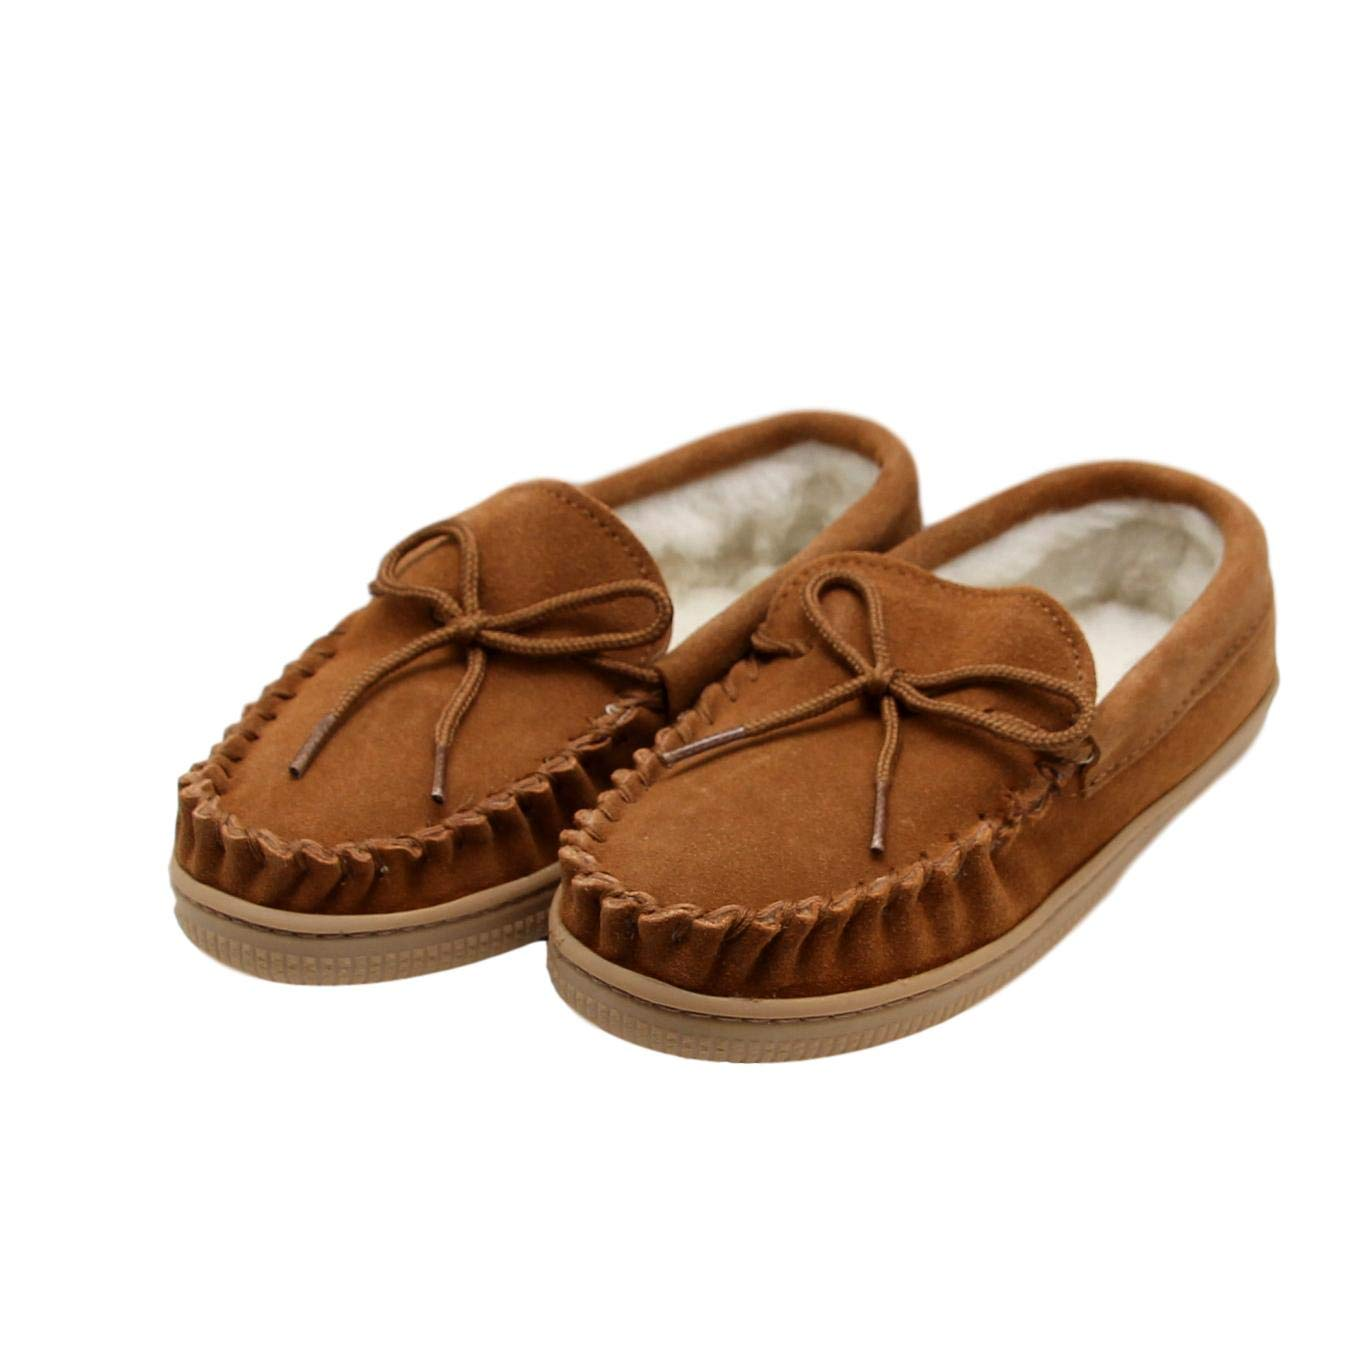 b56a85d4971 Sheepskin World Children s Moccasin  Amazon.co.uk  Shoes   Bags